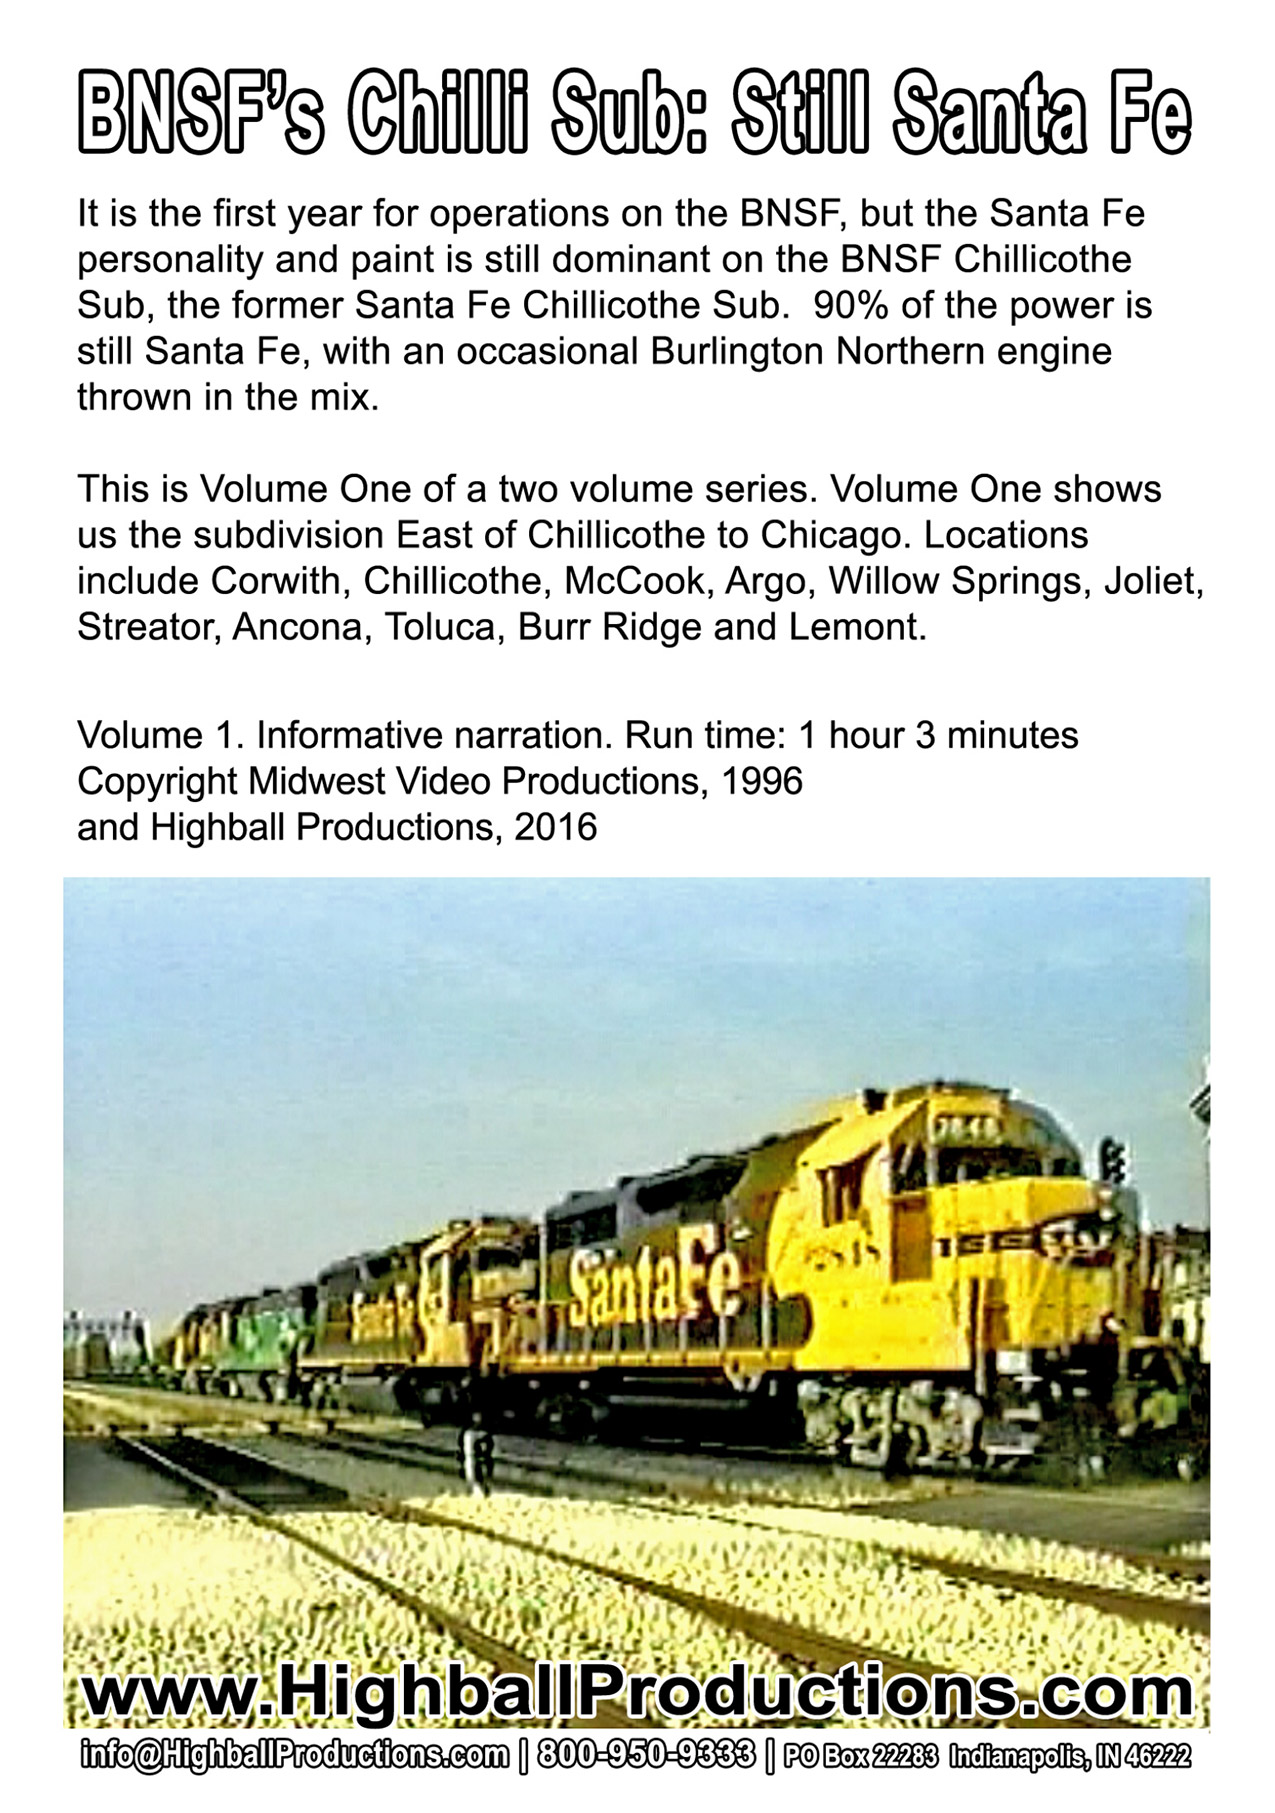 BNSF Chillicothe Sub: Still Santa Fe Volume 1, East of